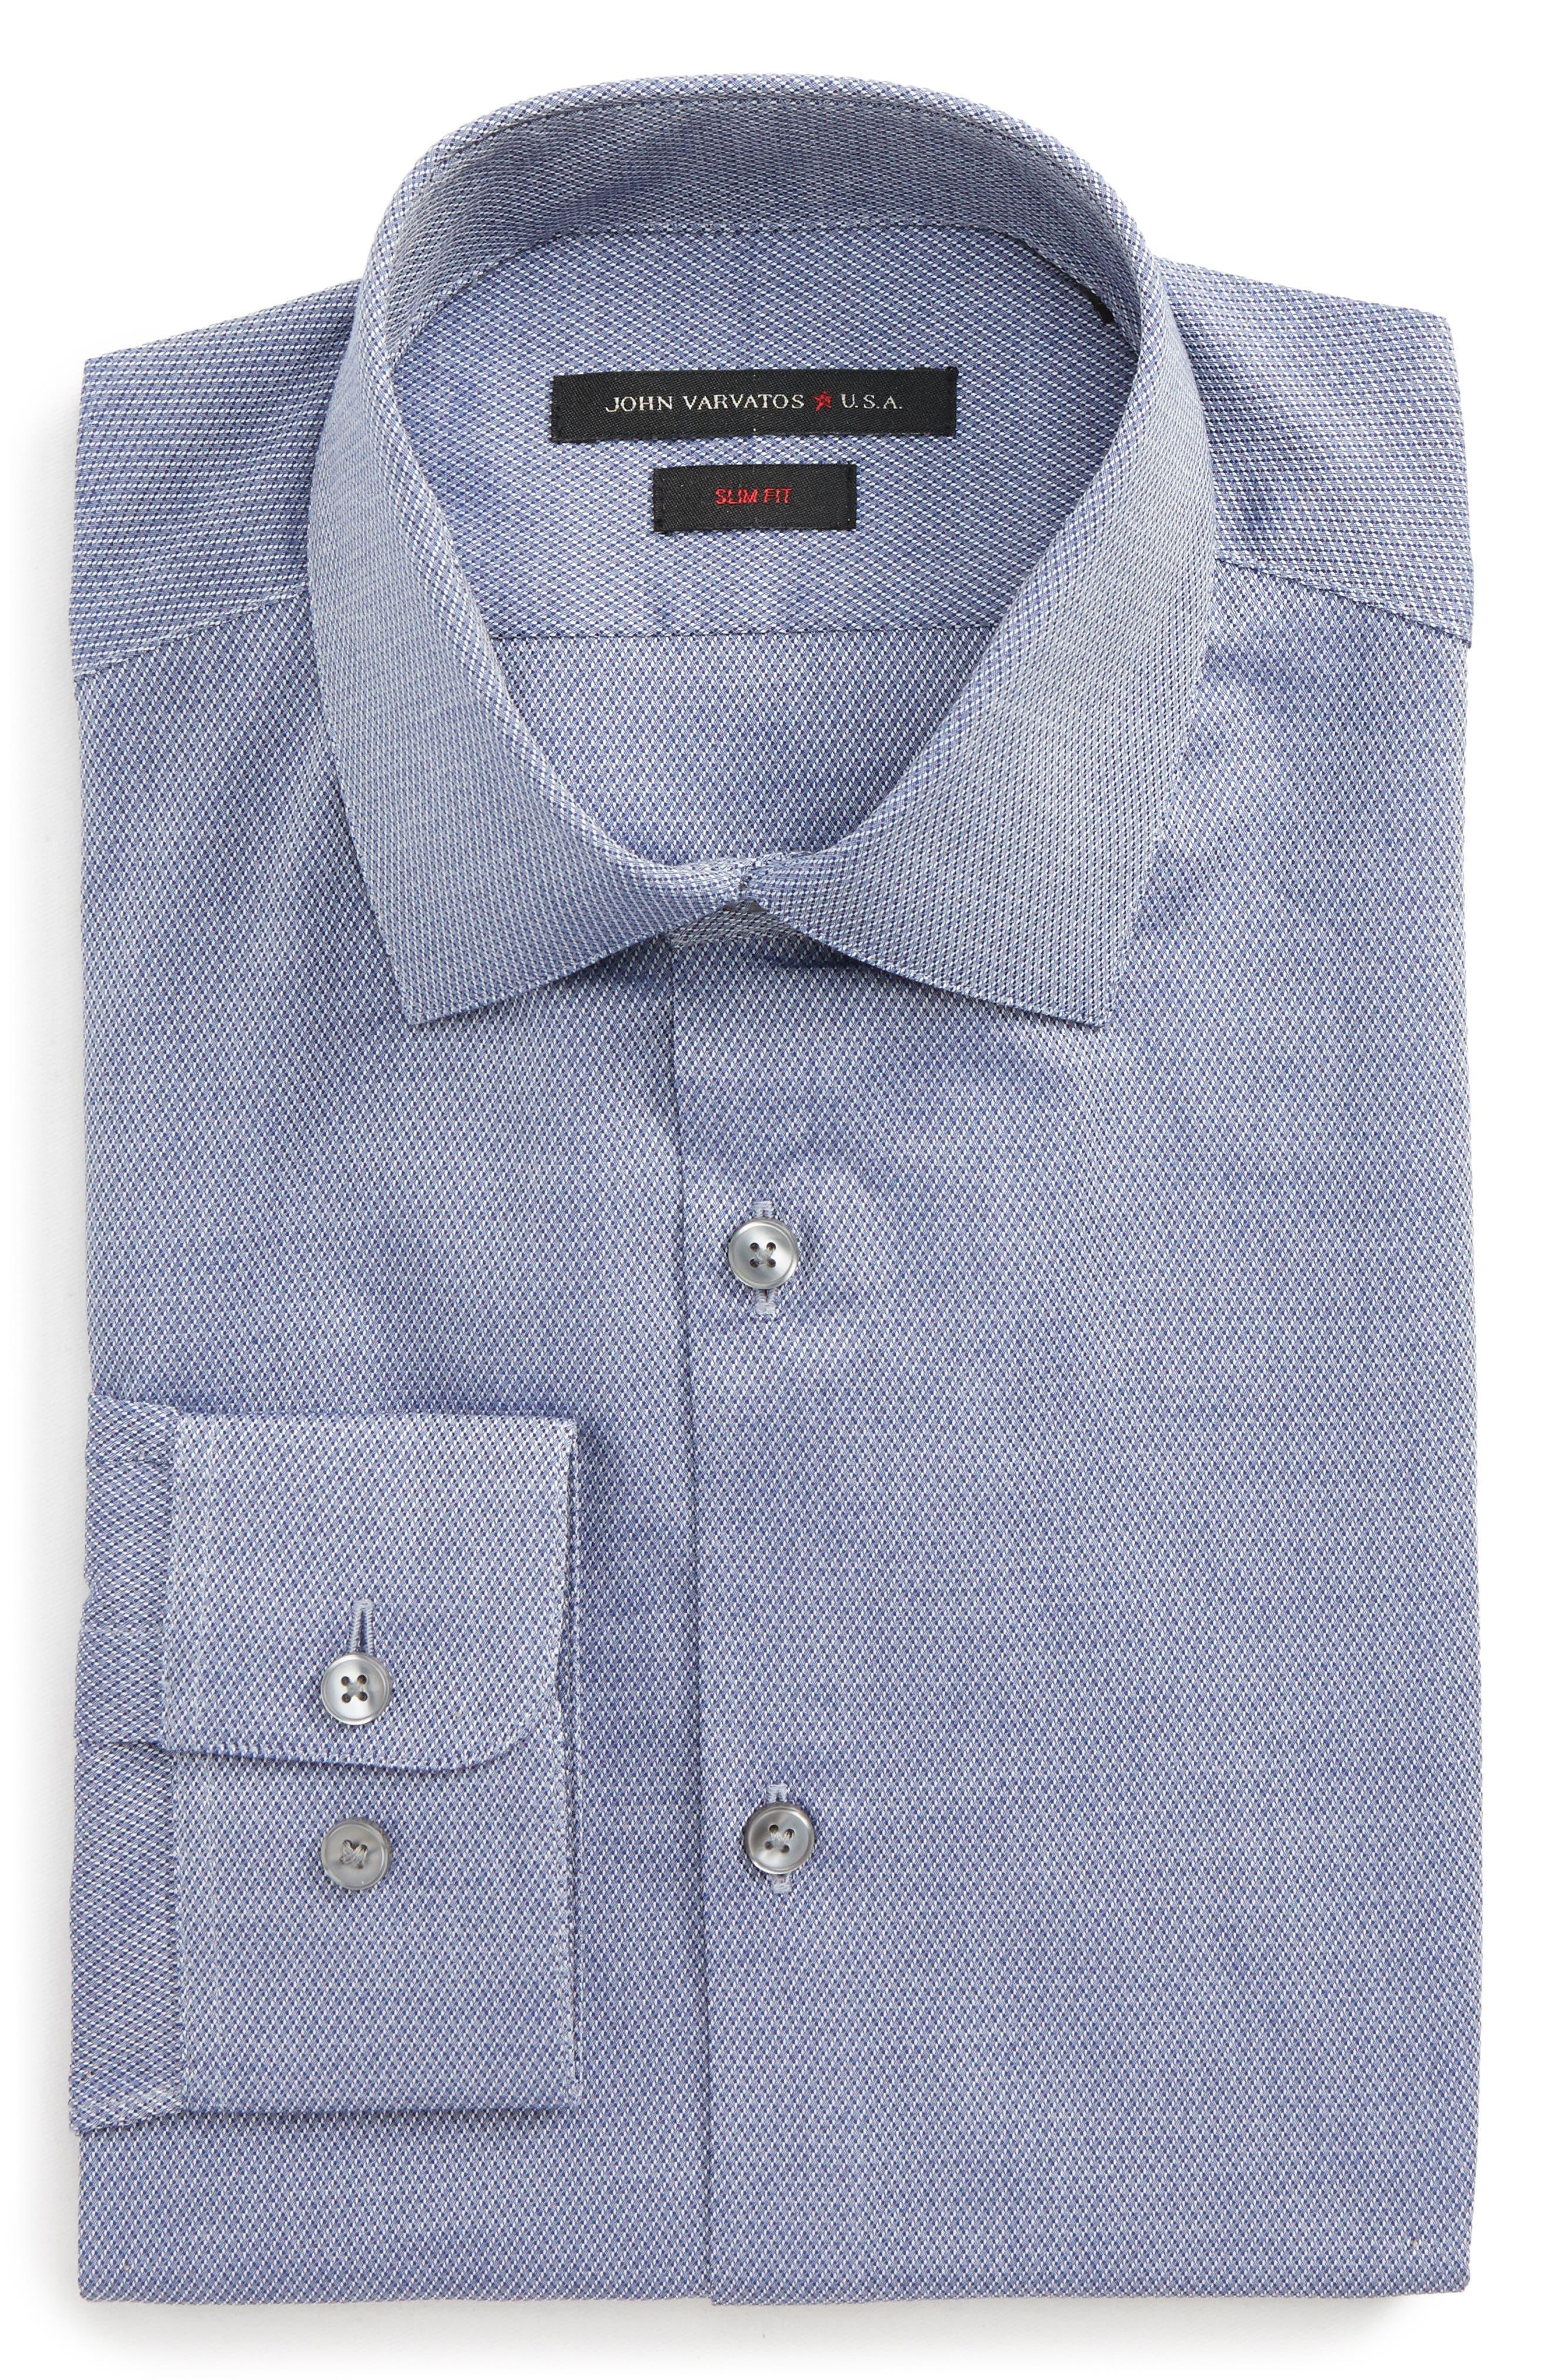 Slim Fit Stretch Geometric Dress Shirt,                             Main thumbnail 1, color,                             439